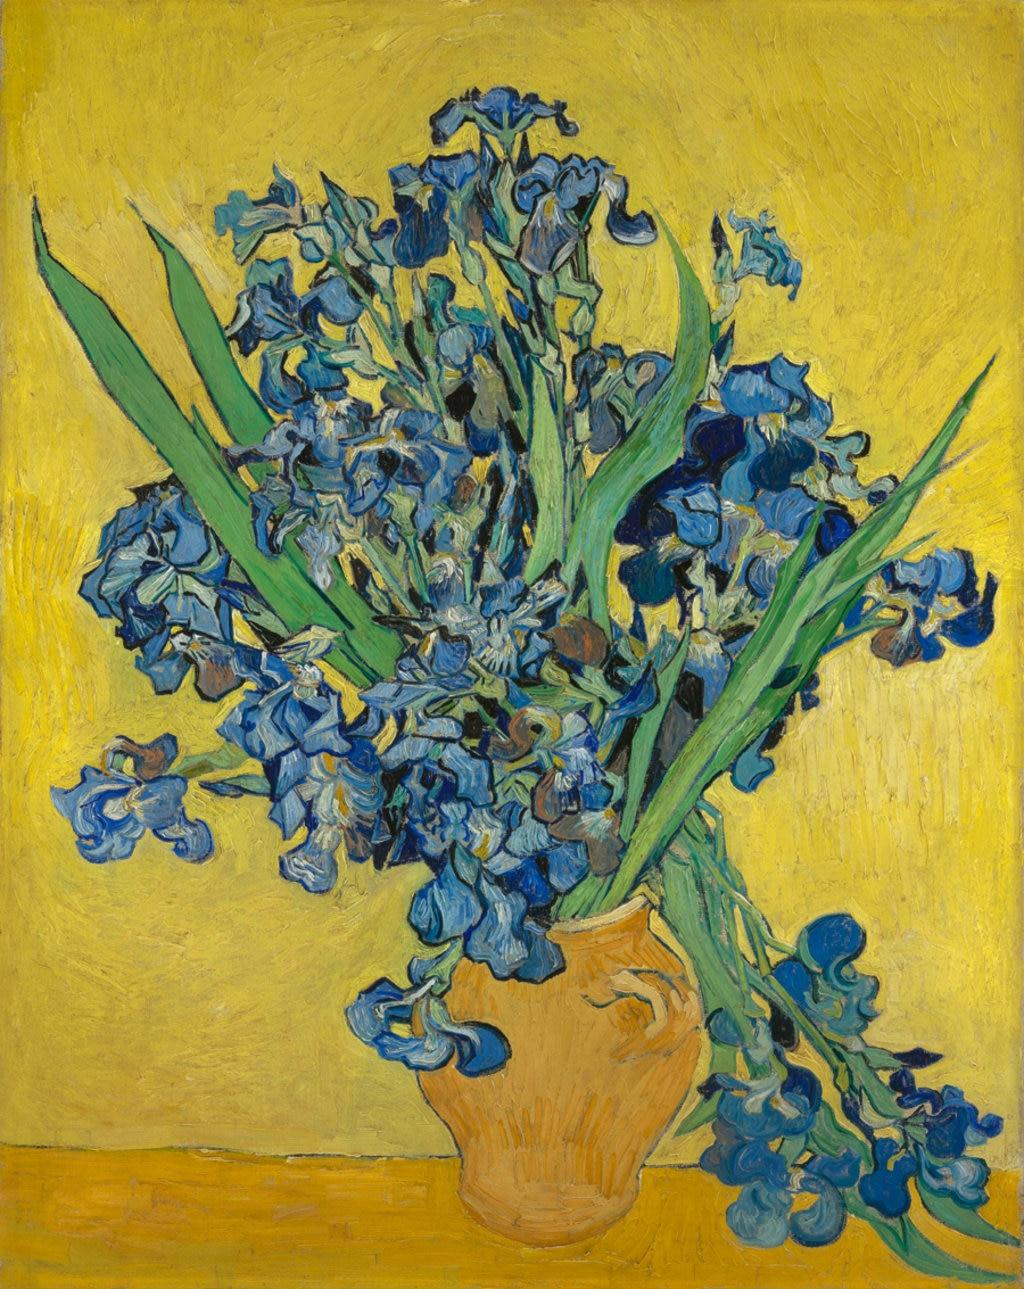 Vincent van Gogh, Vaso con Iris, 1890. Courtesy of the Van Gogh Museum, Amsterdam